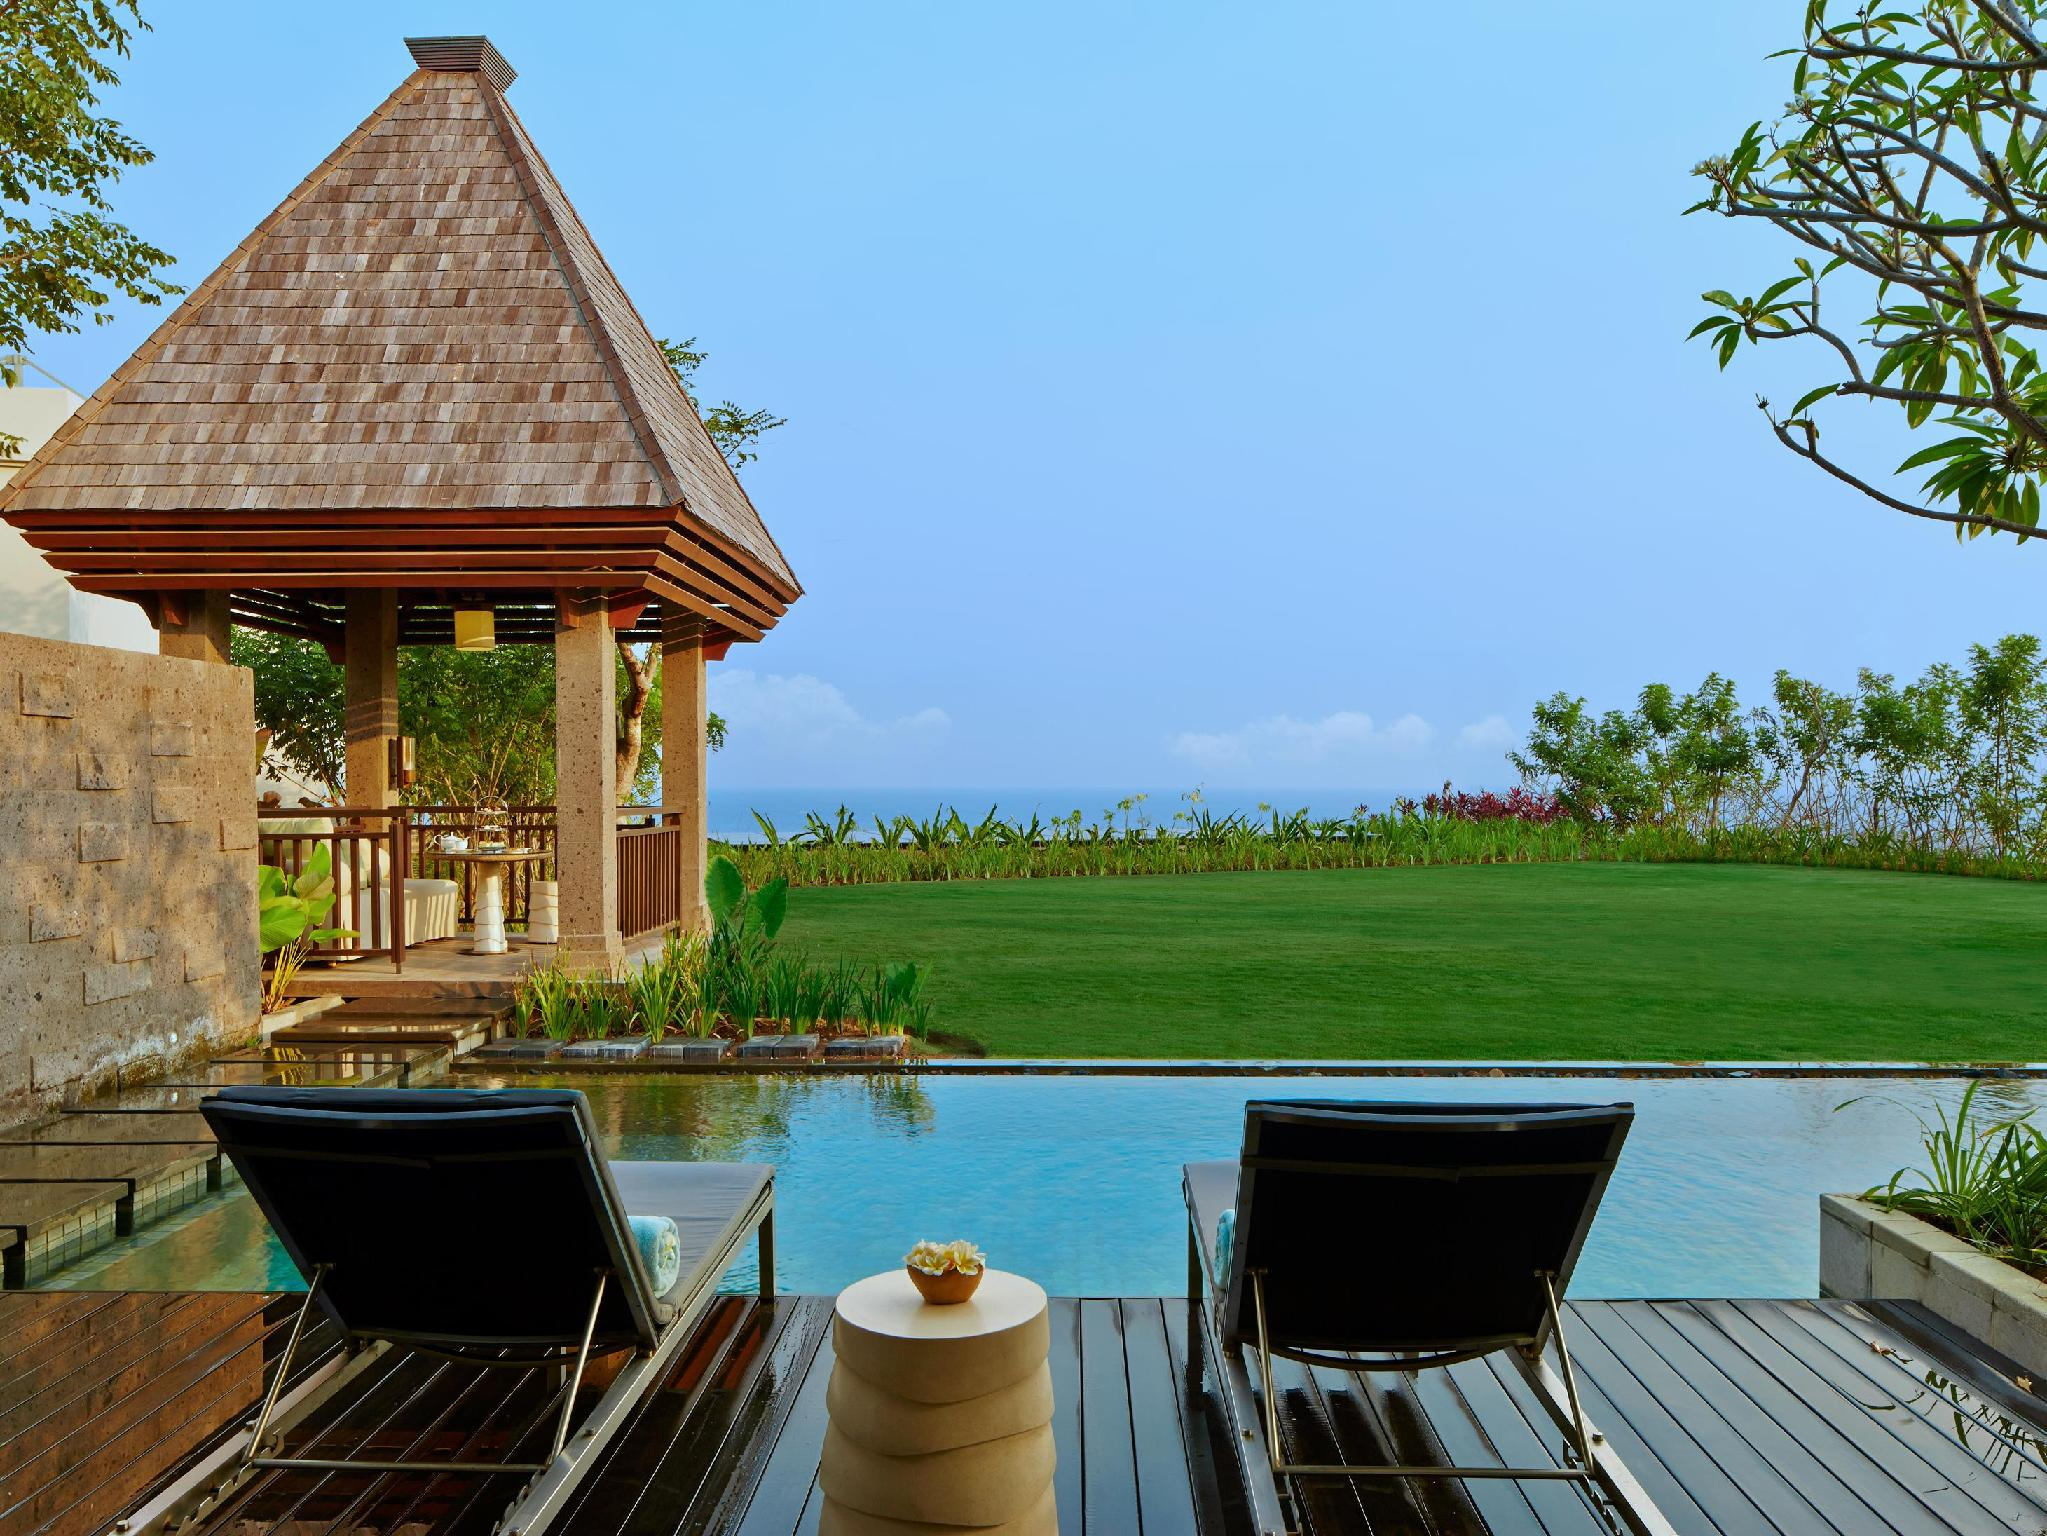 The Ritz-Carlton Bali34